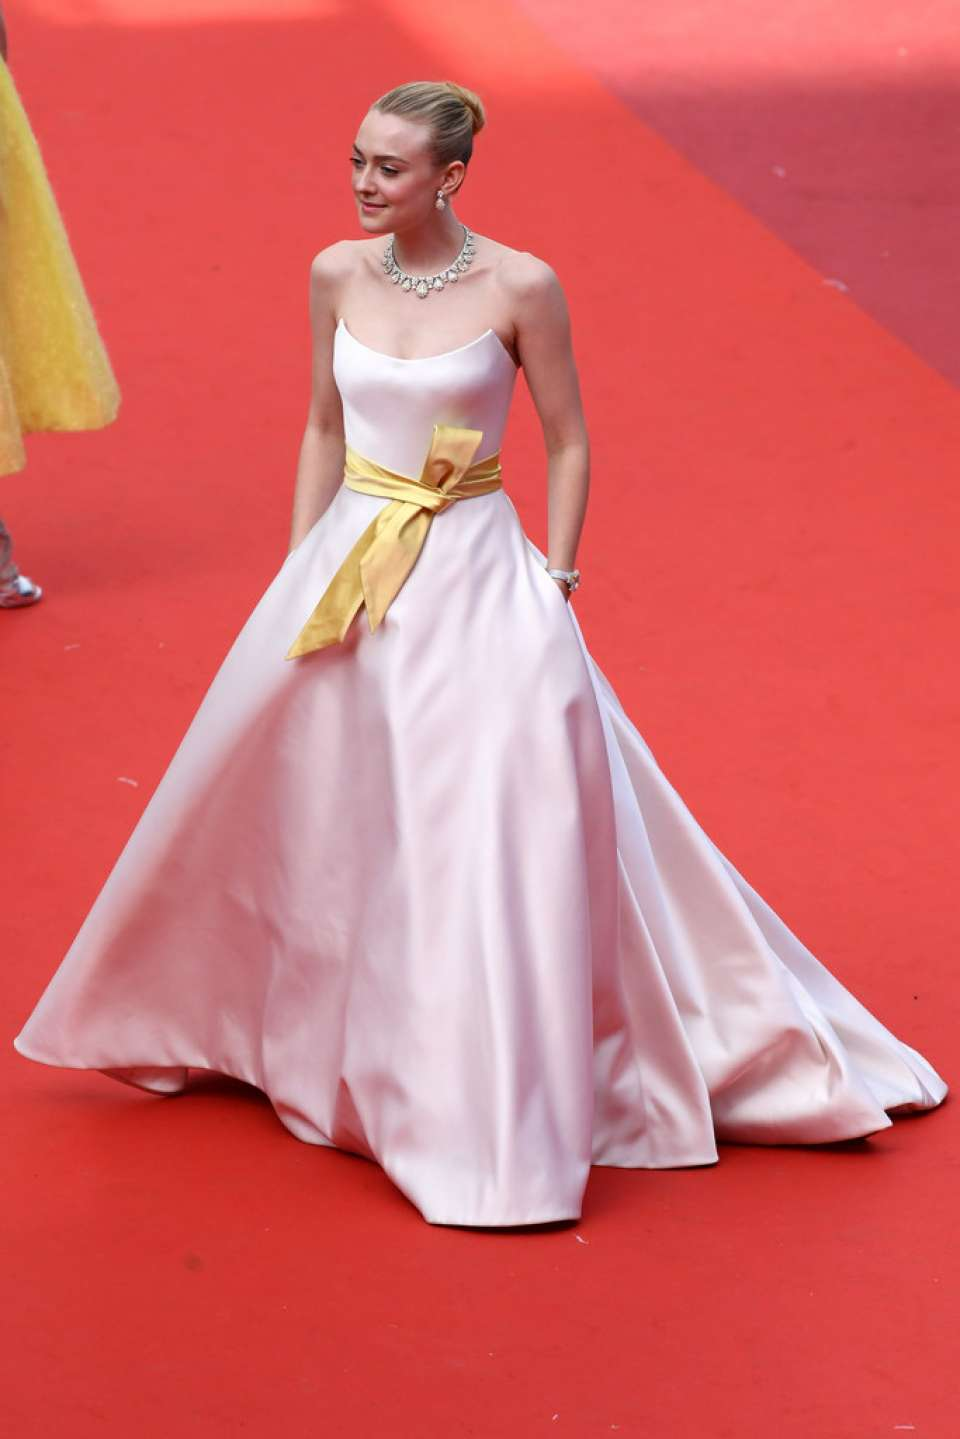 Dakota Fanning 2019 : Dakota Fanning: Once Upon A Time In Hollywood Premiere-01